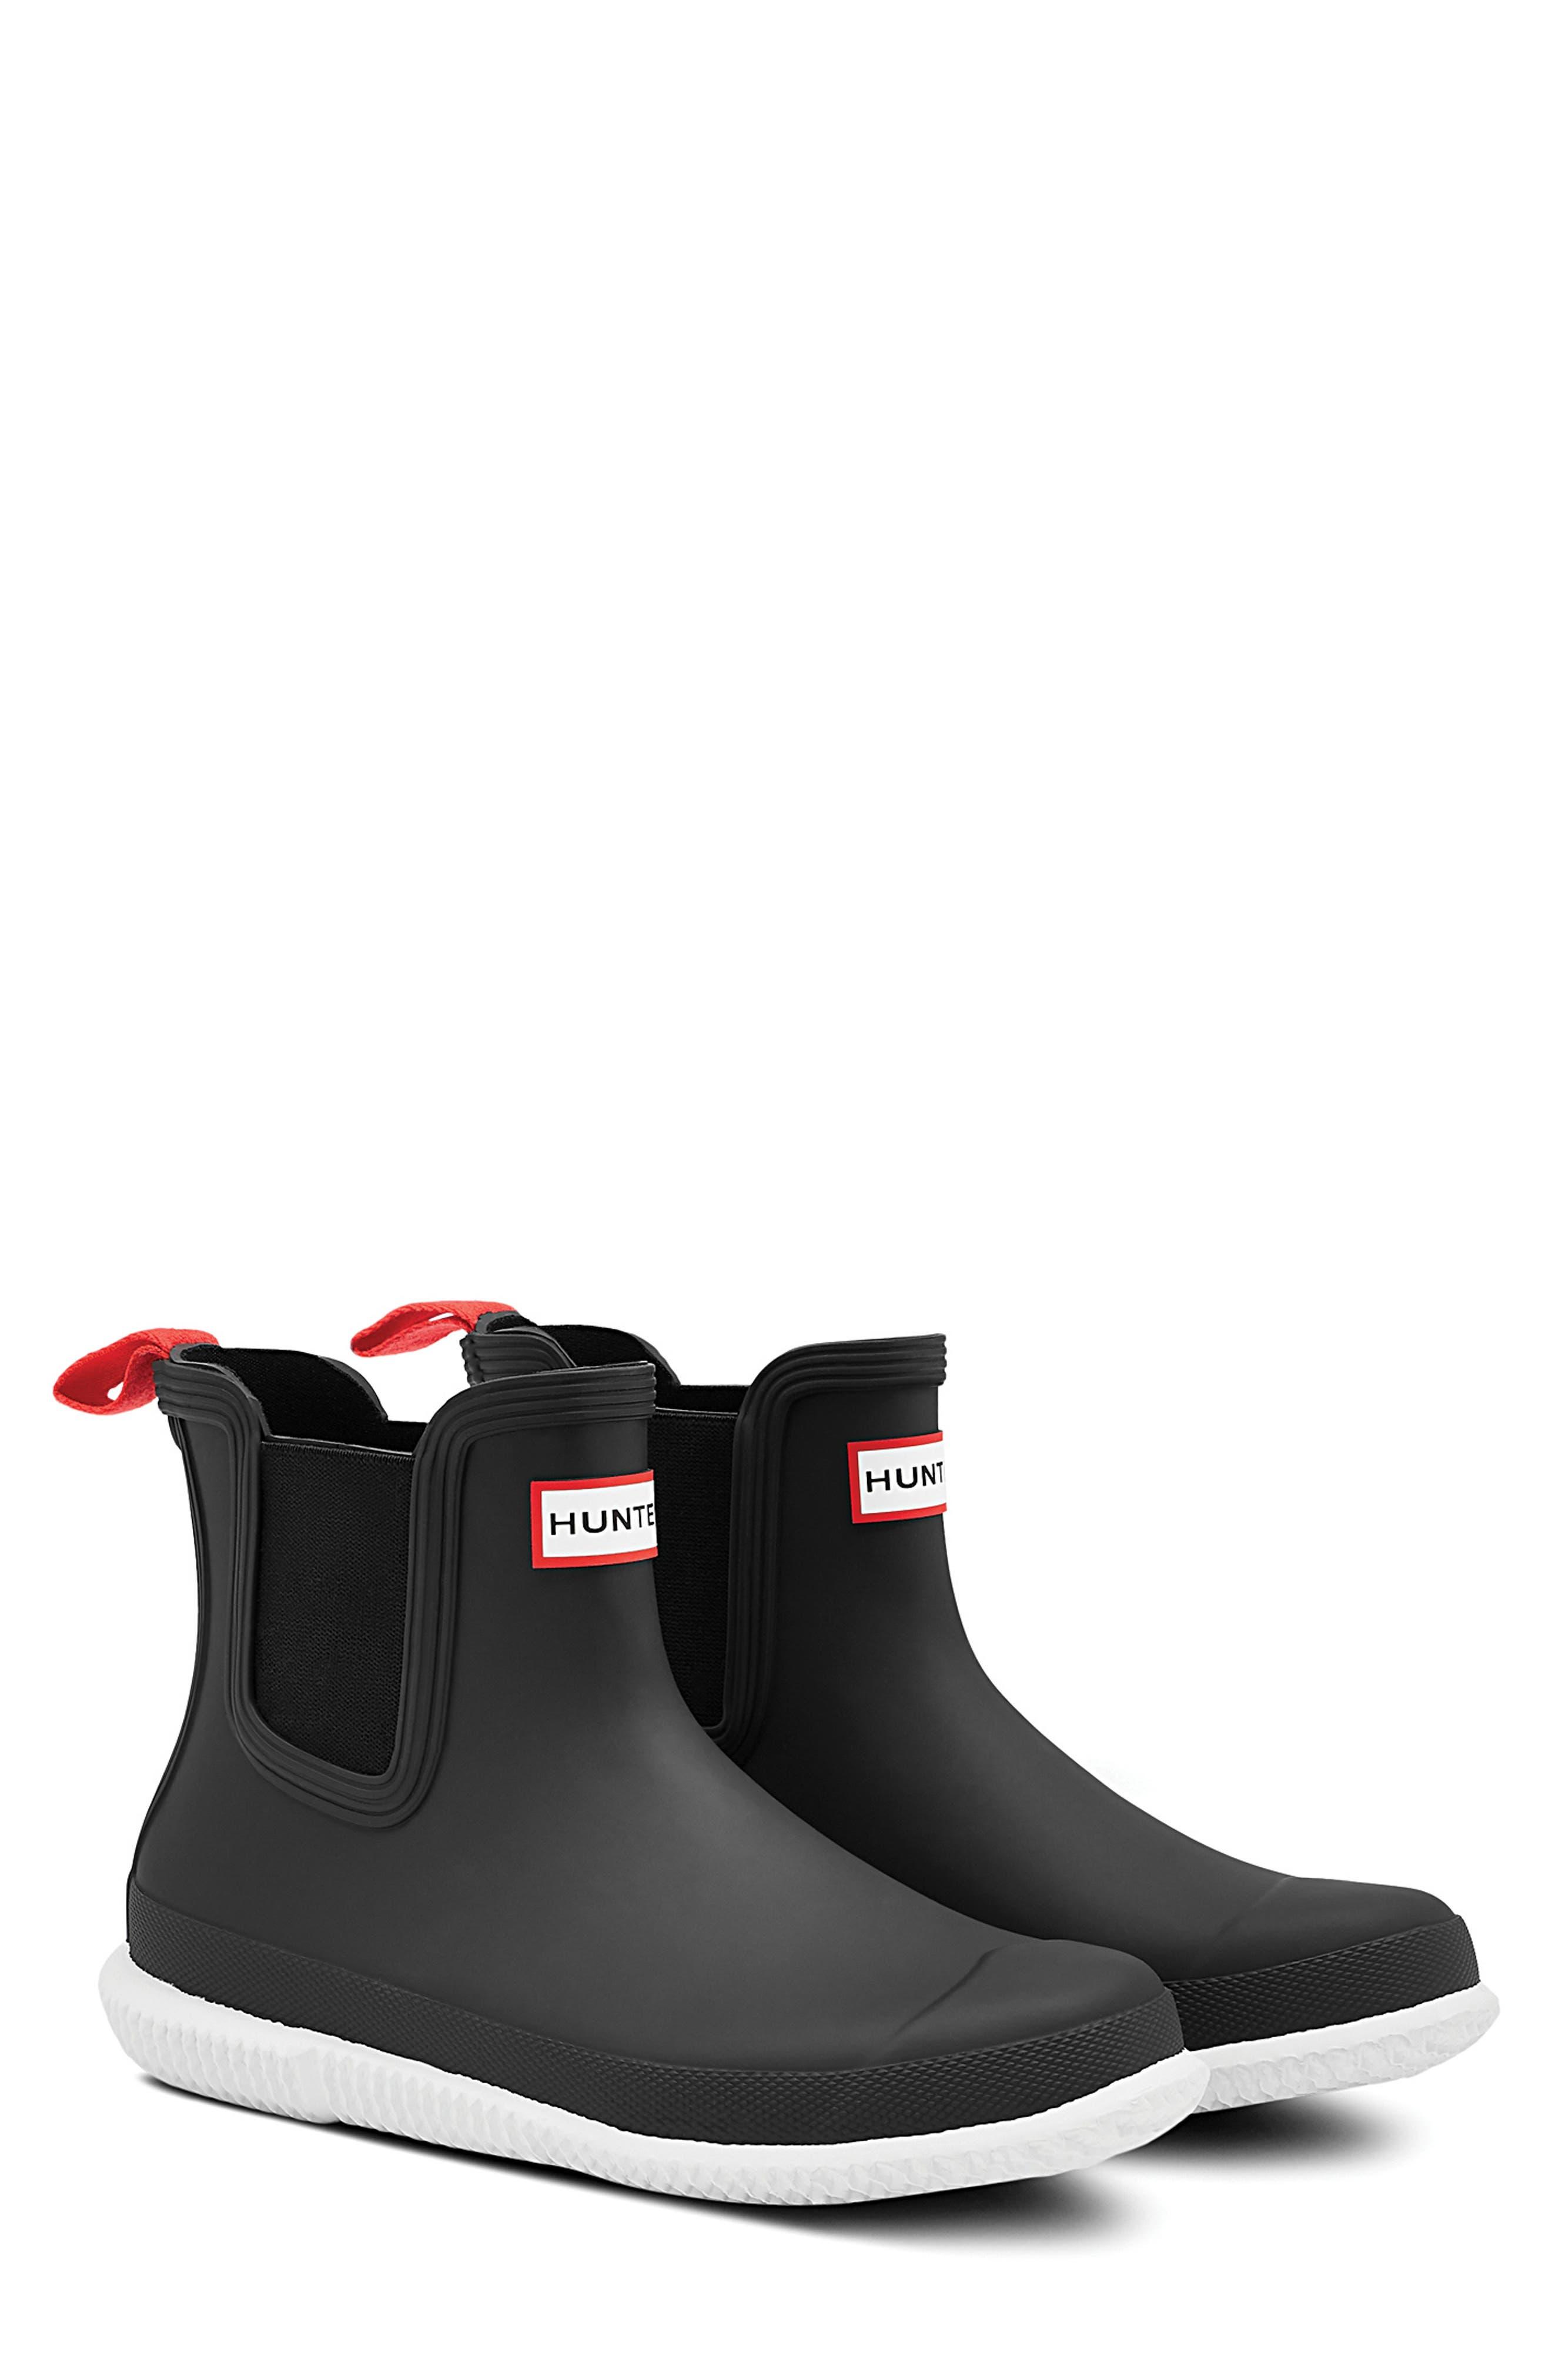 Calendar Sole Waterproof Chelsea Rain Boot